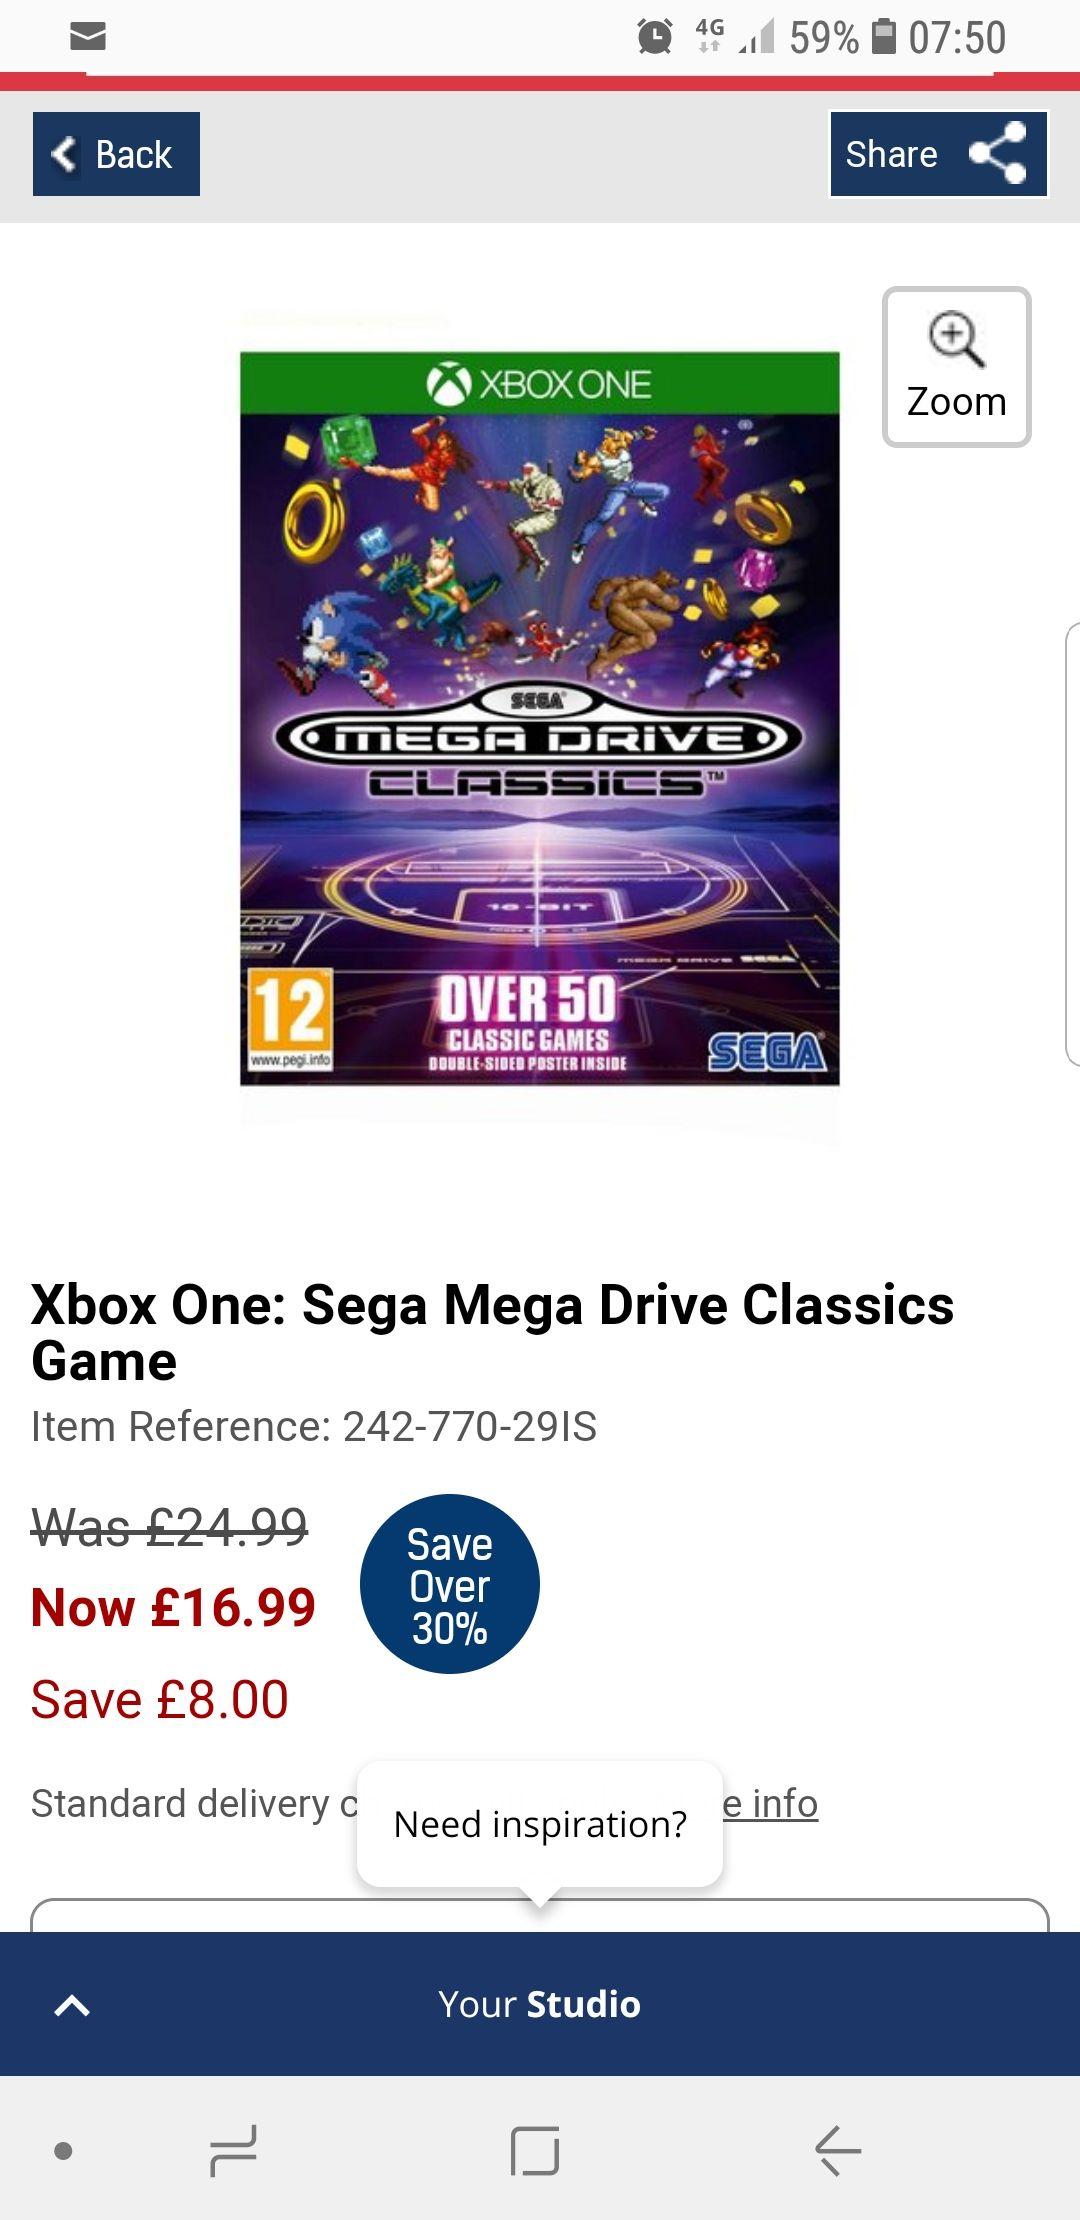 Sega mega drive classics xbox one now £16.99 see comments for free del at  Studio